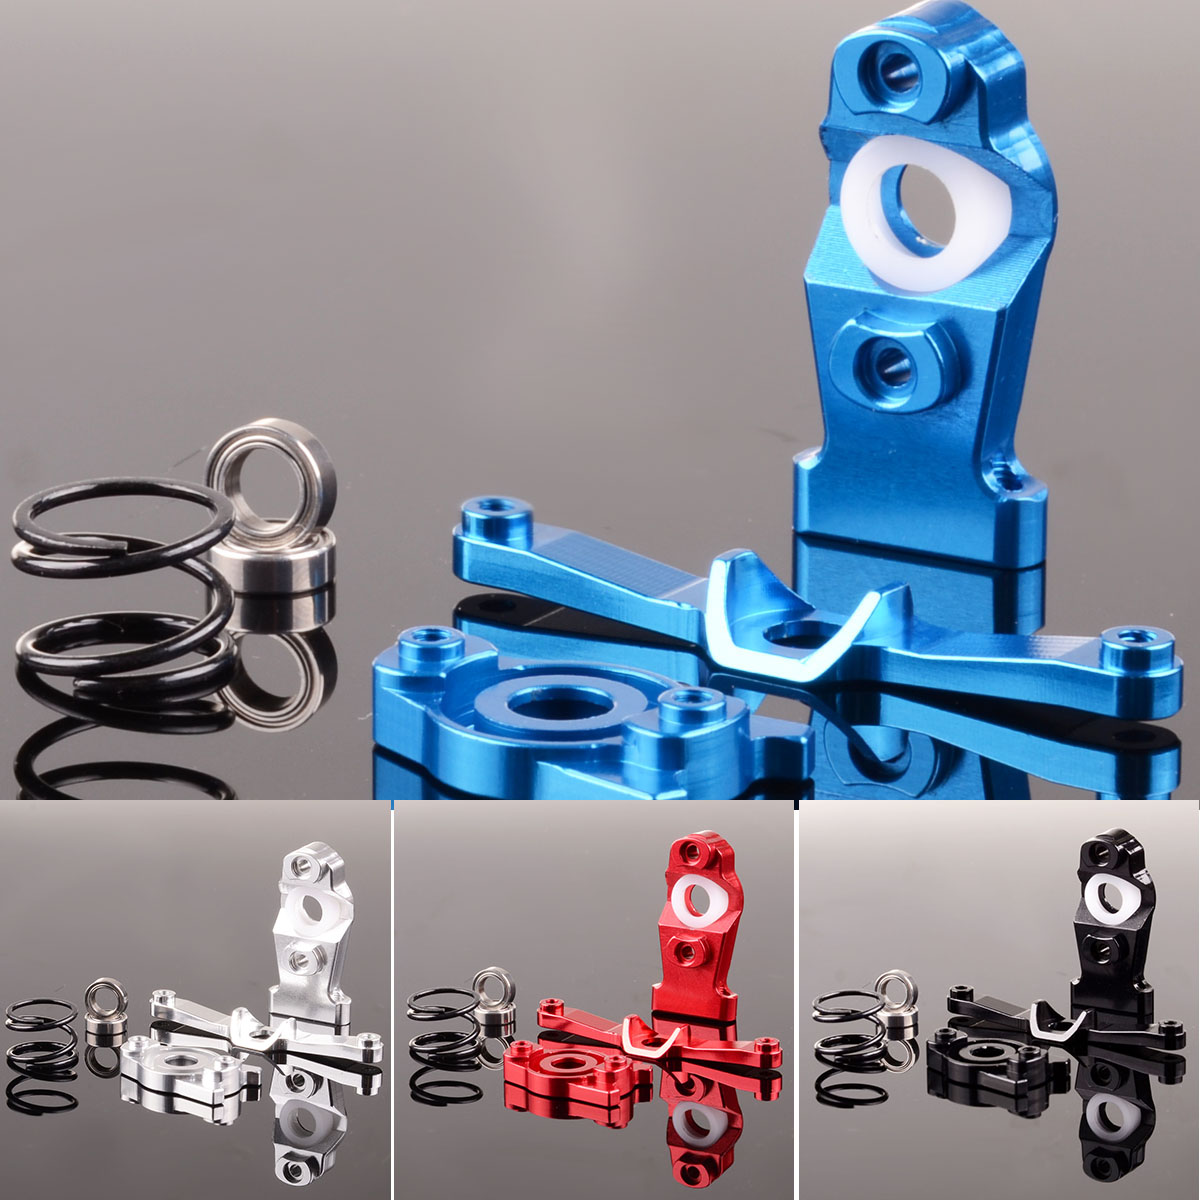 small resolution of aluminum steering assembly erv048 for rc gpm traxxas 1 16 e revo slash summit 1 16